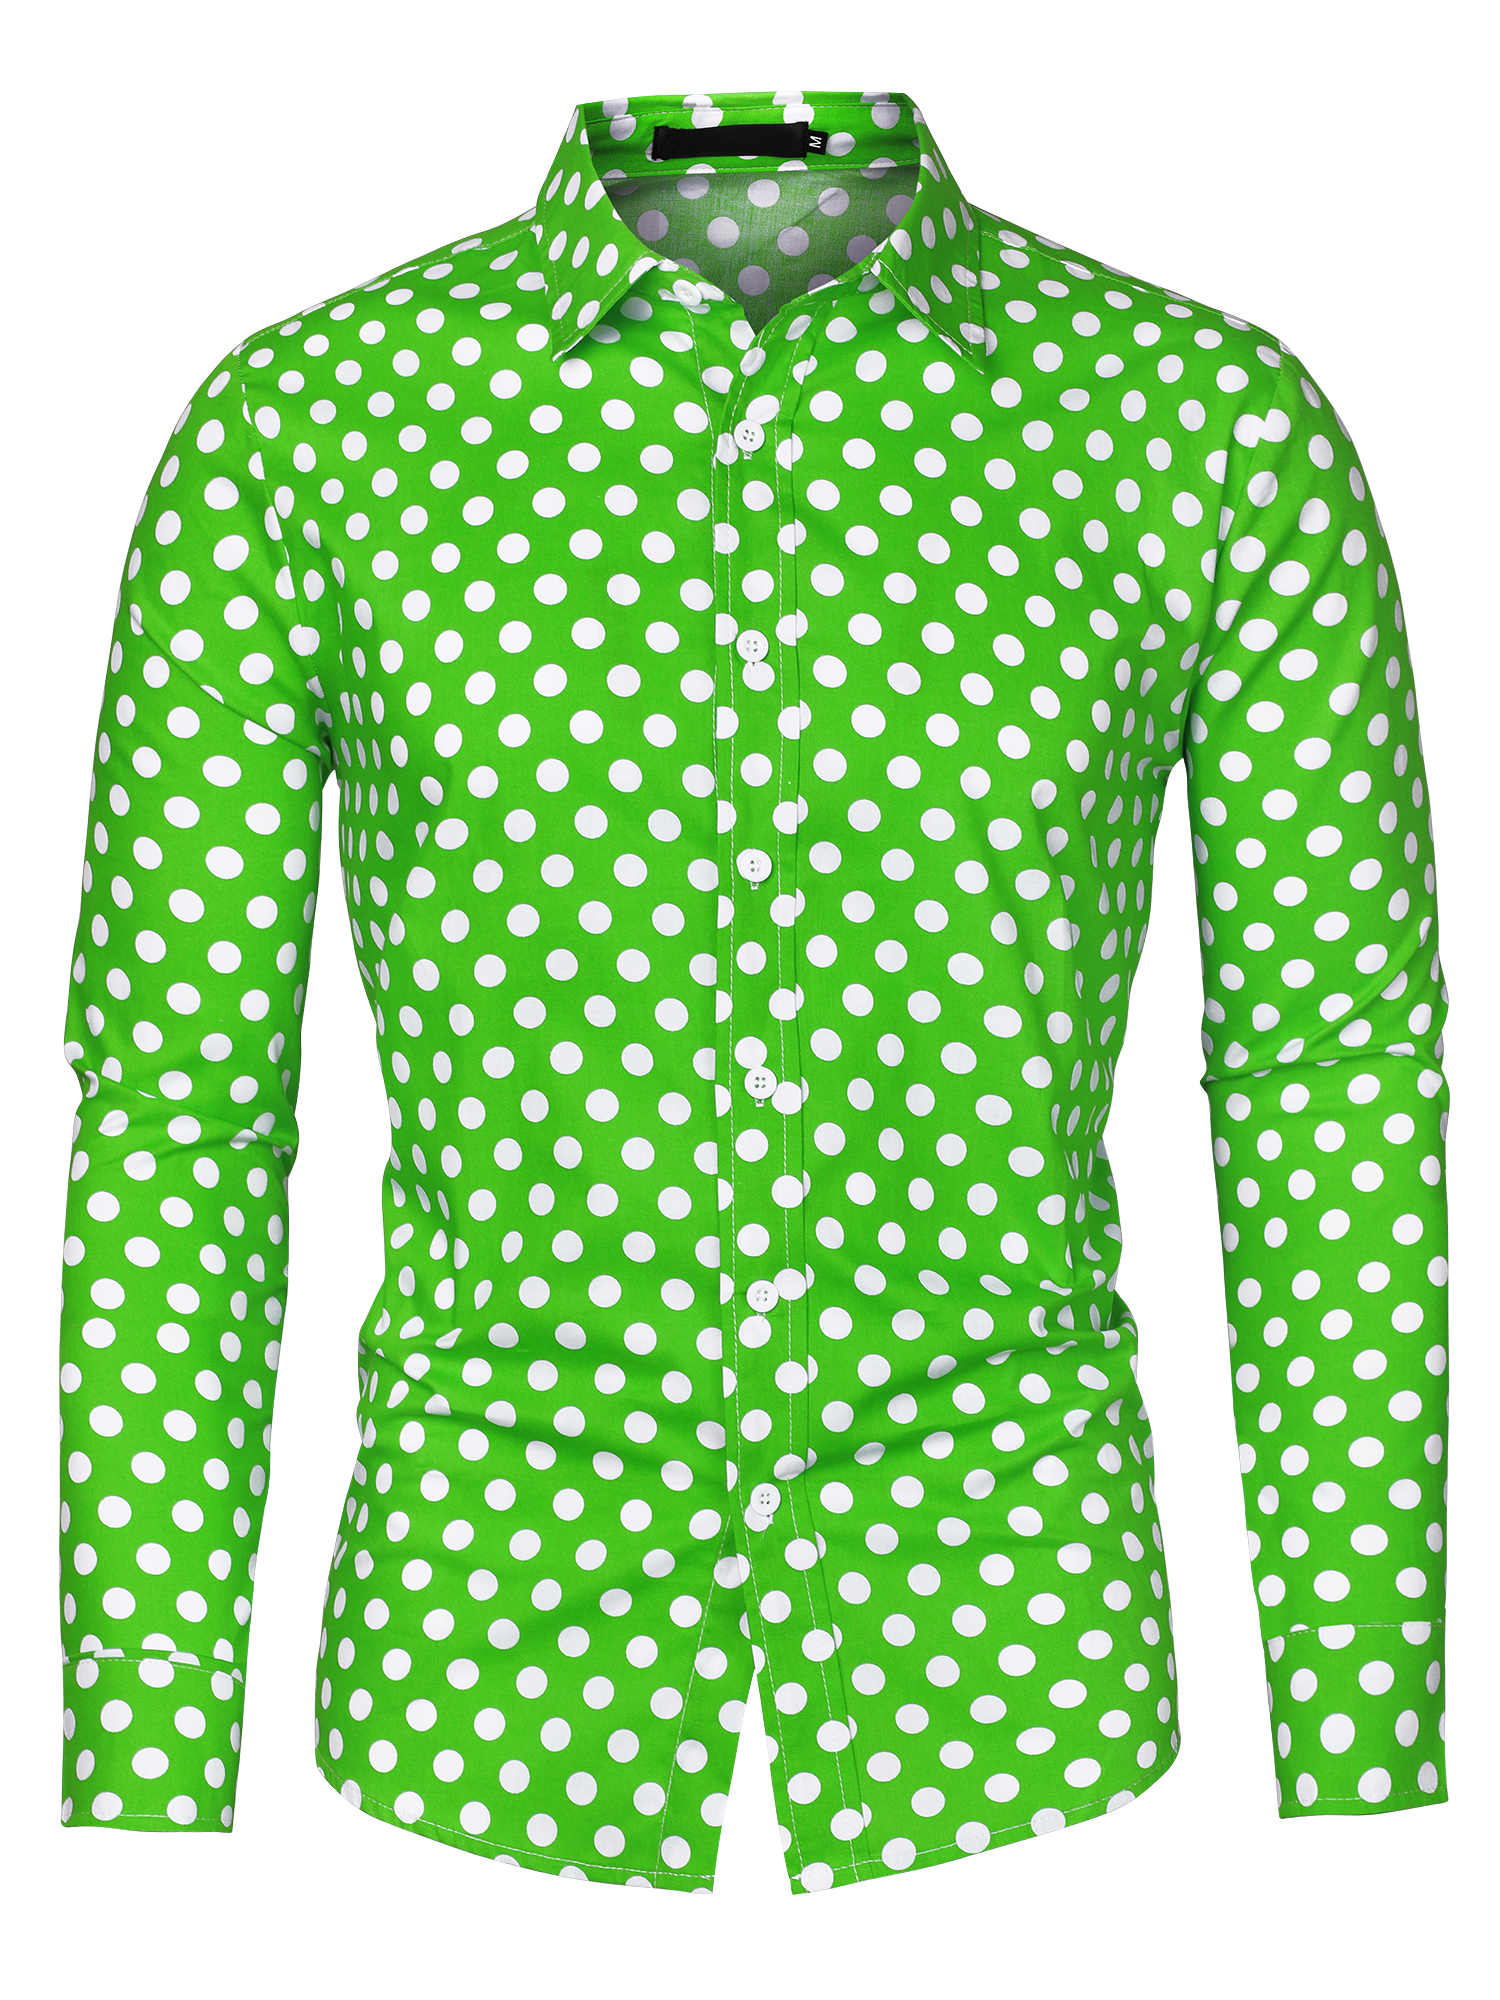 Men 100% Cotton Polka Dots Long Sleeve Slim Fit Dress Shirt Green 50